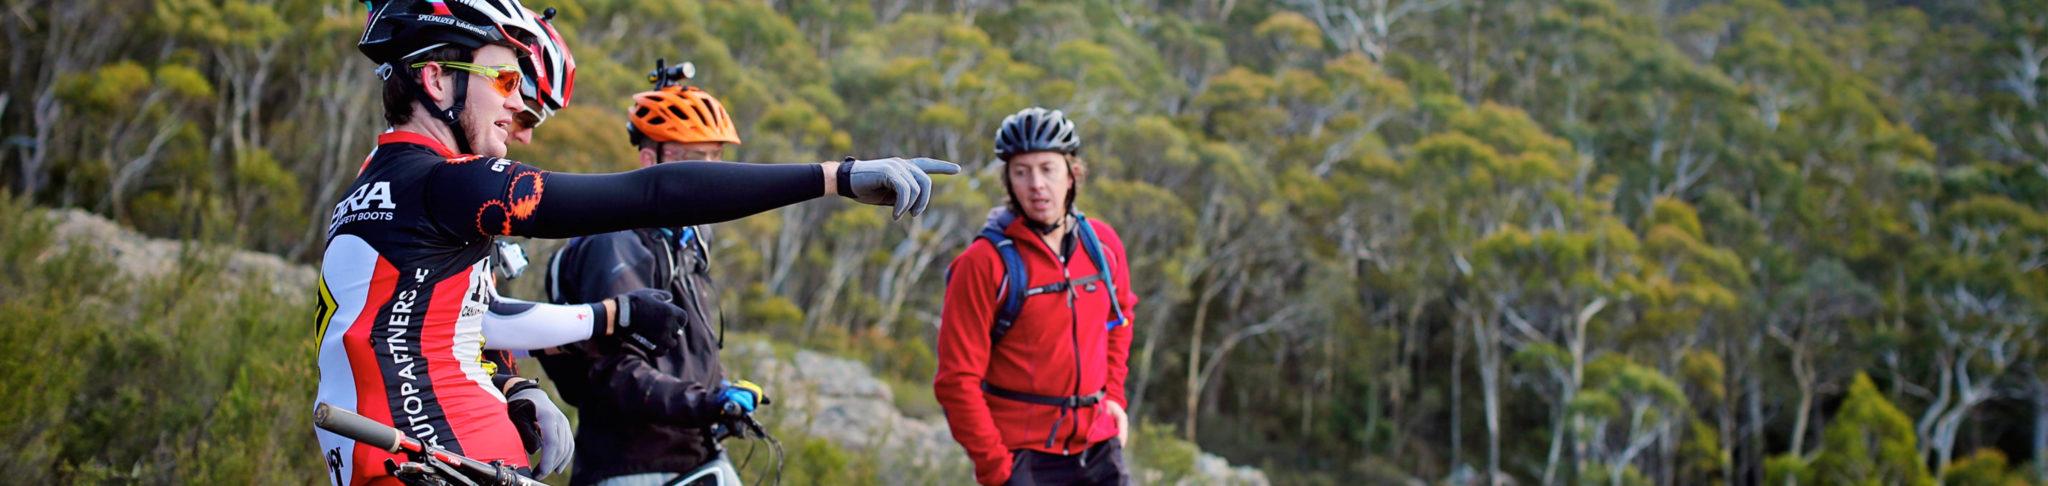 Image of bike riders at Mount Canobolas